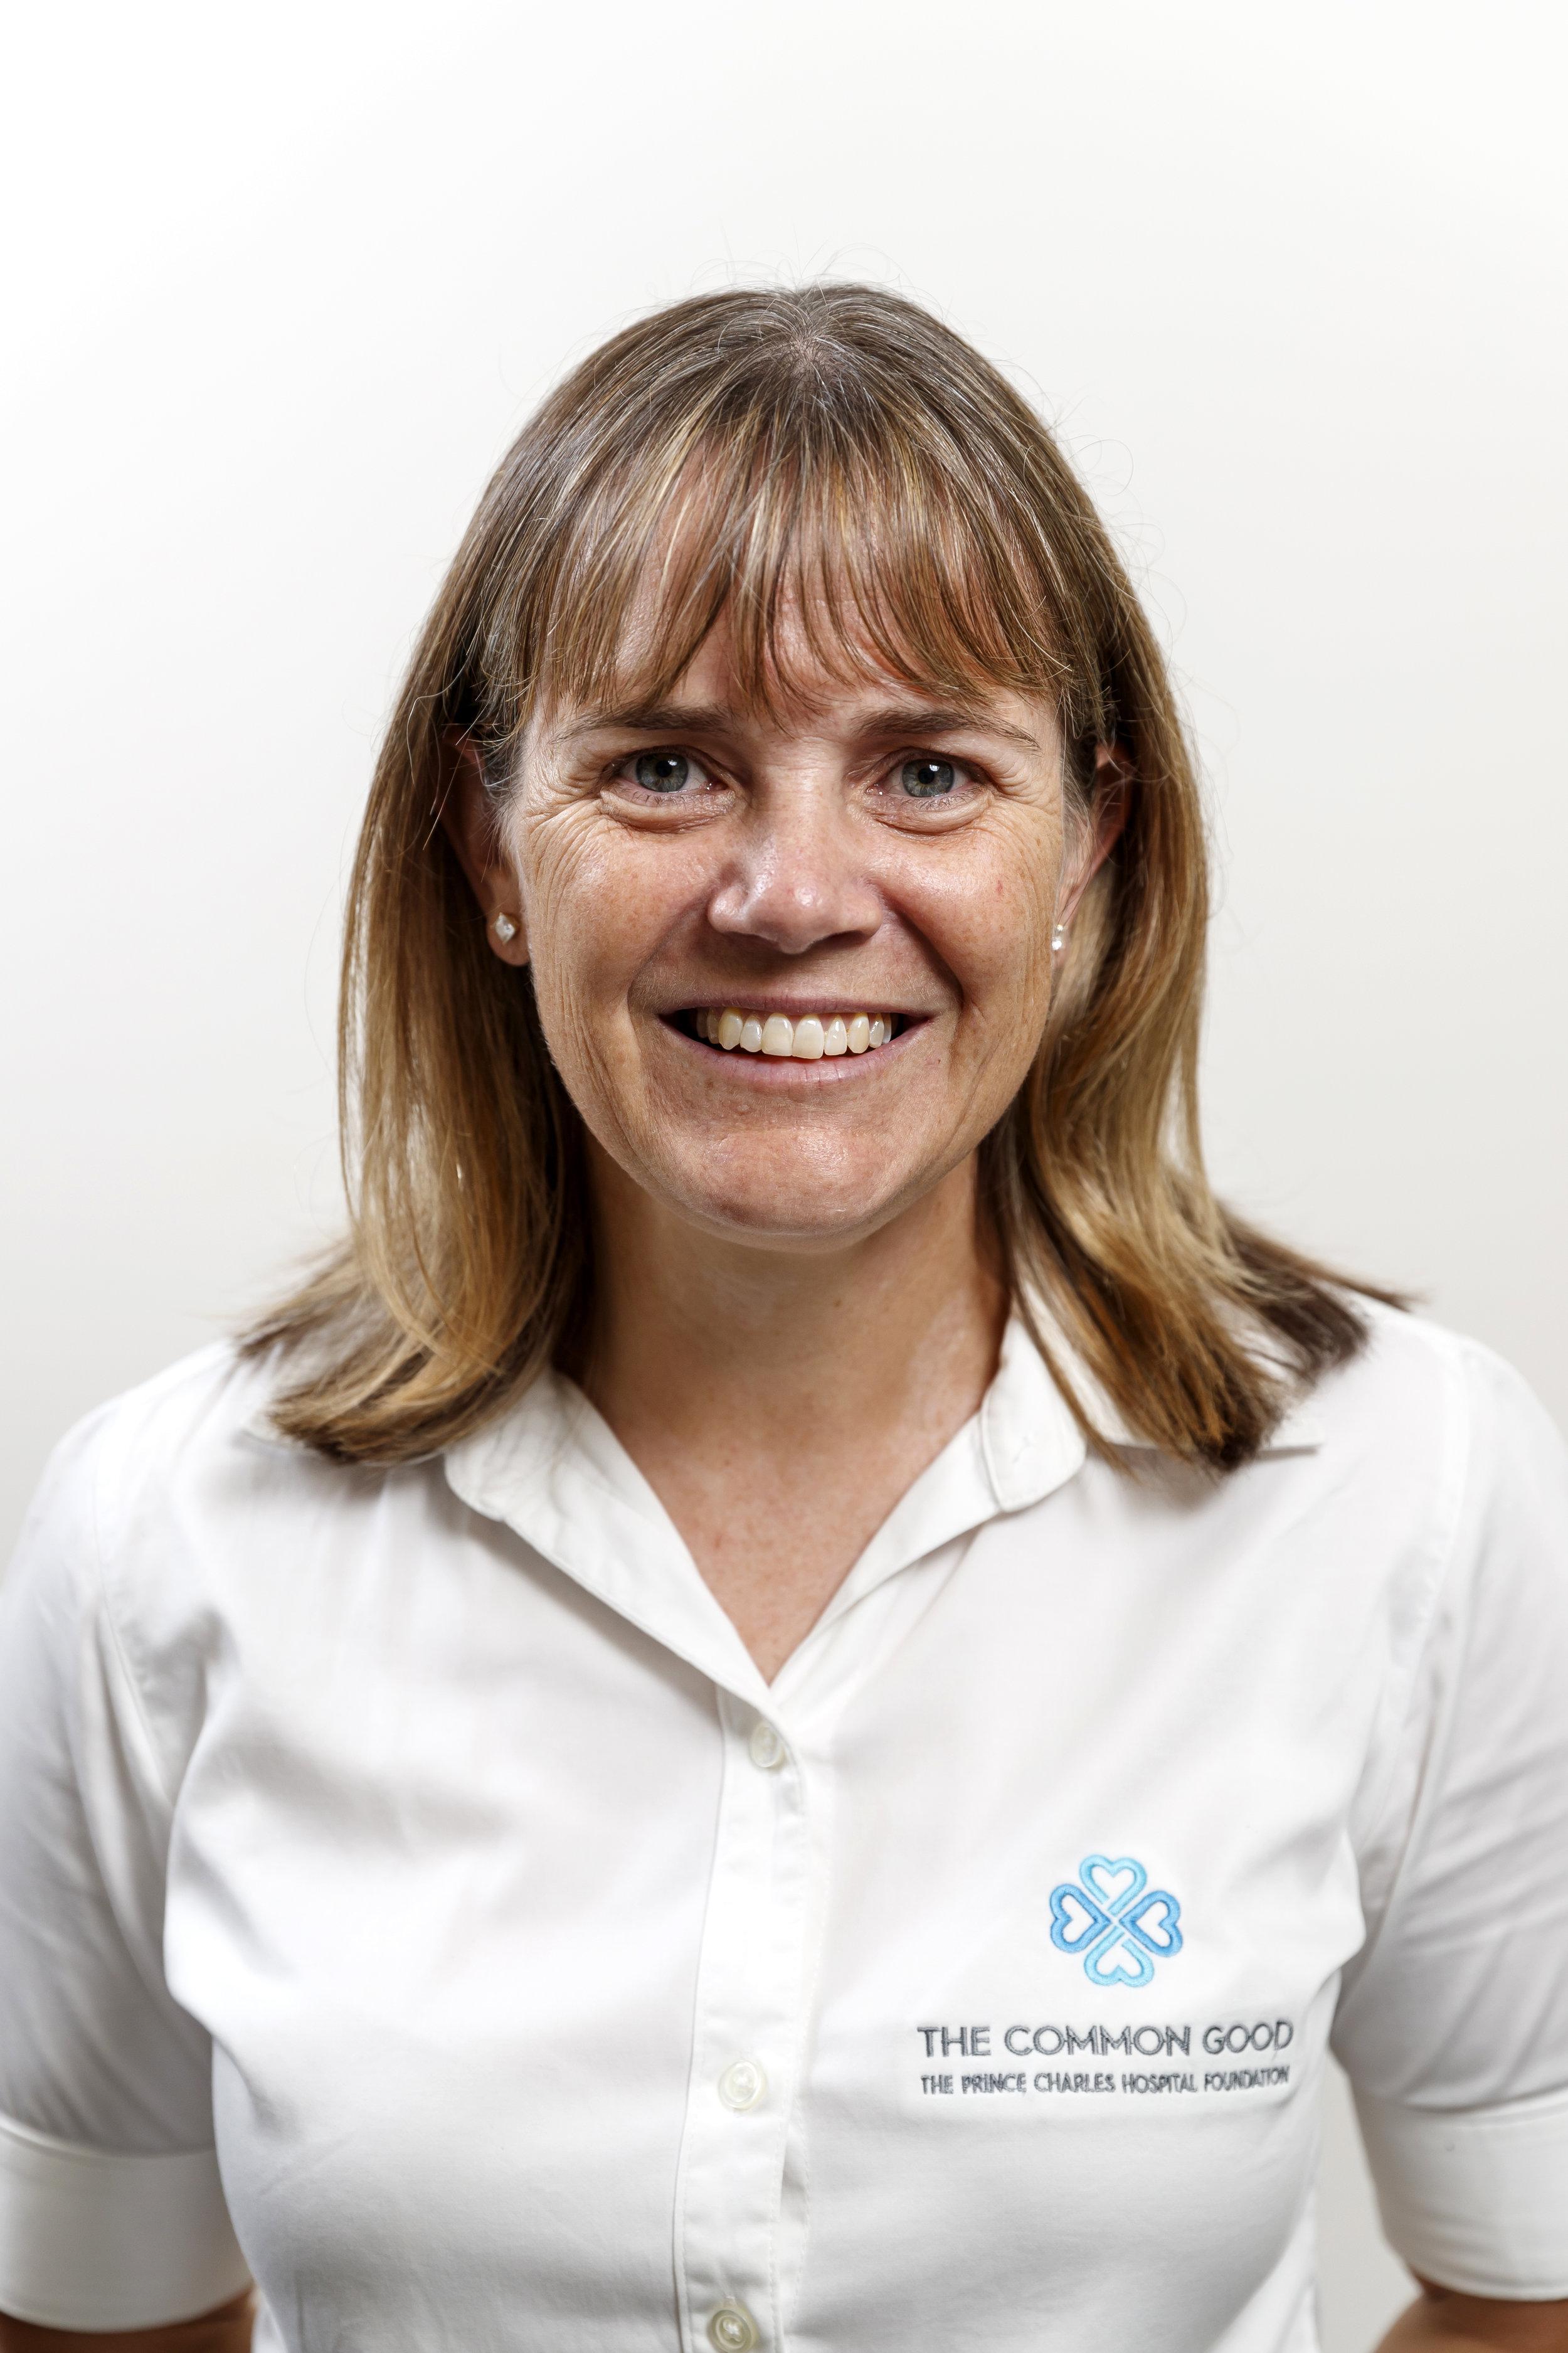 Dr Stephanie Yerkovich   Partner Investigator    The Prince Charles Hospital Foundation